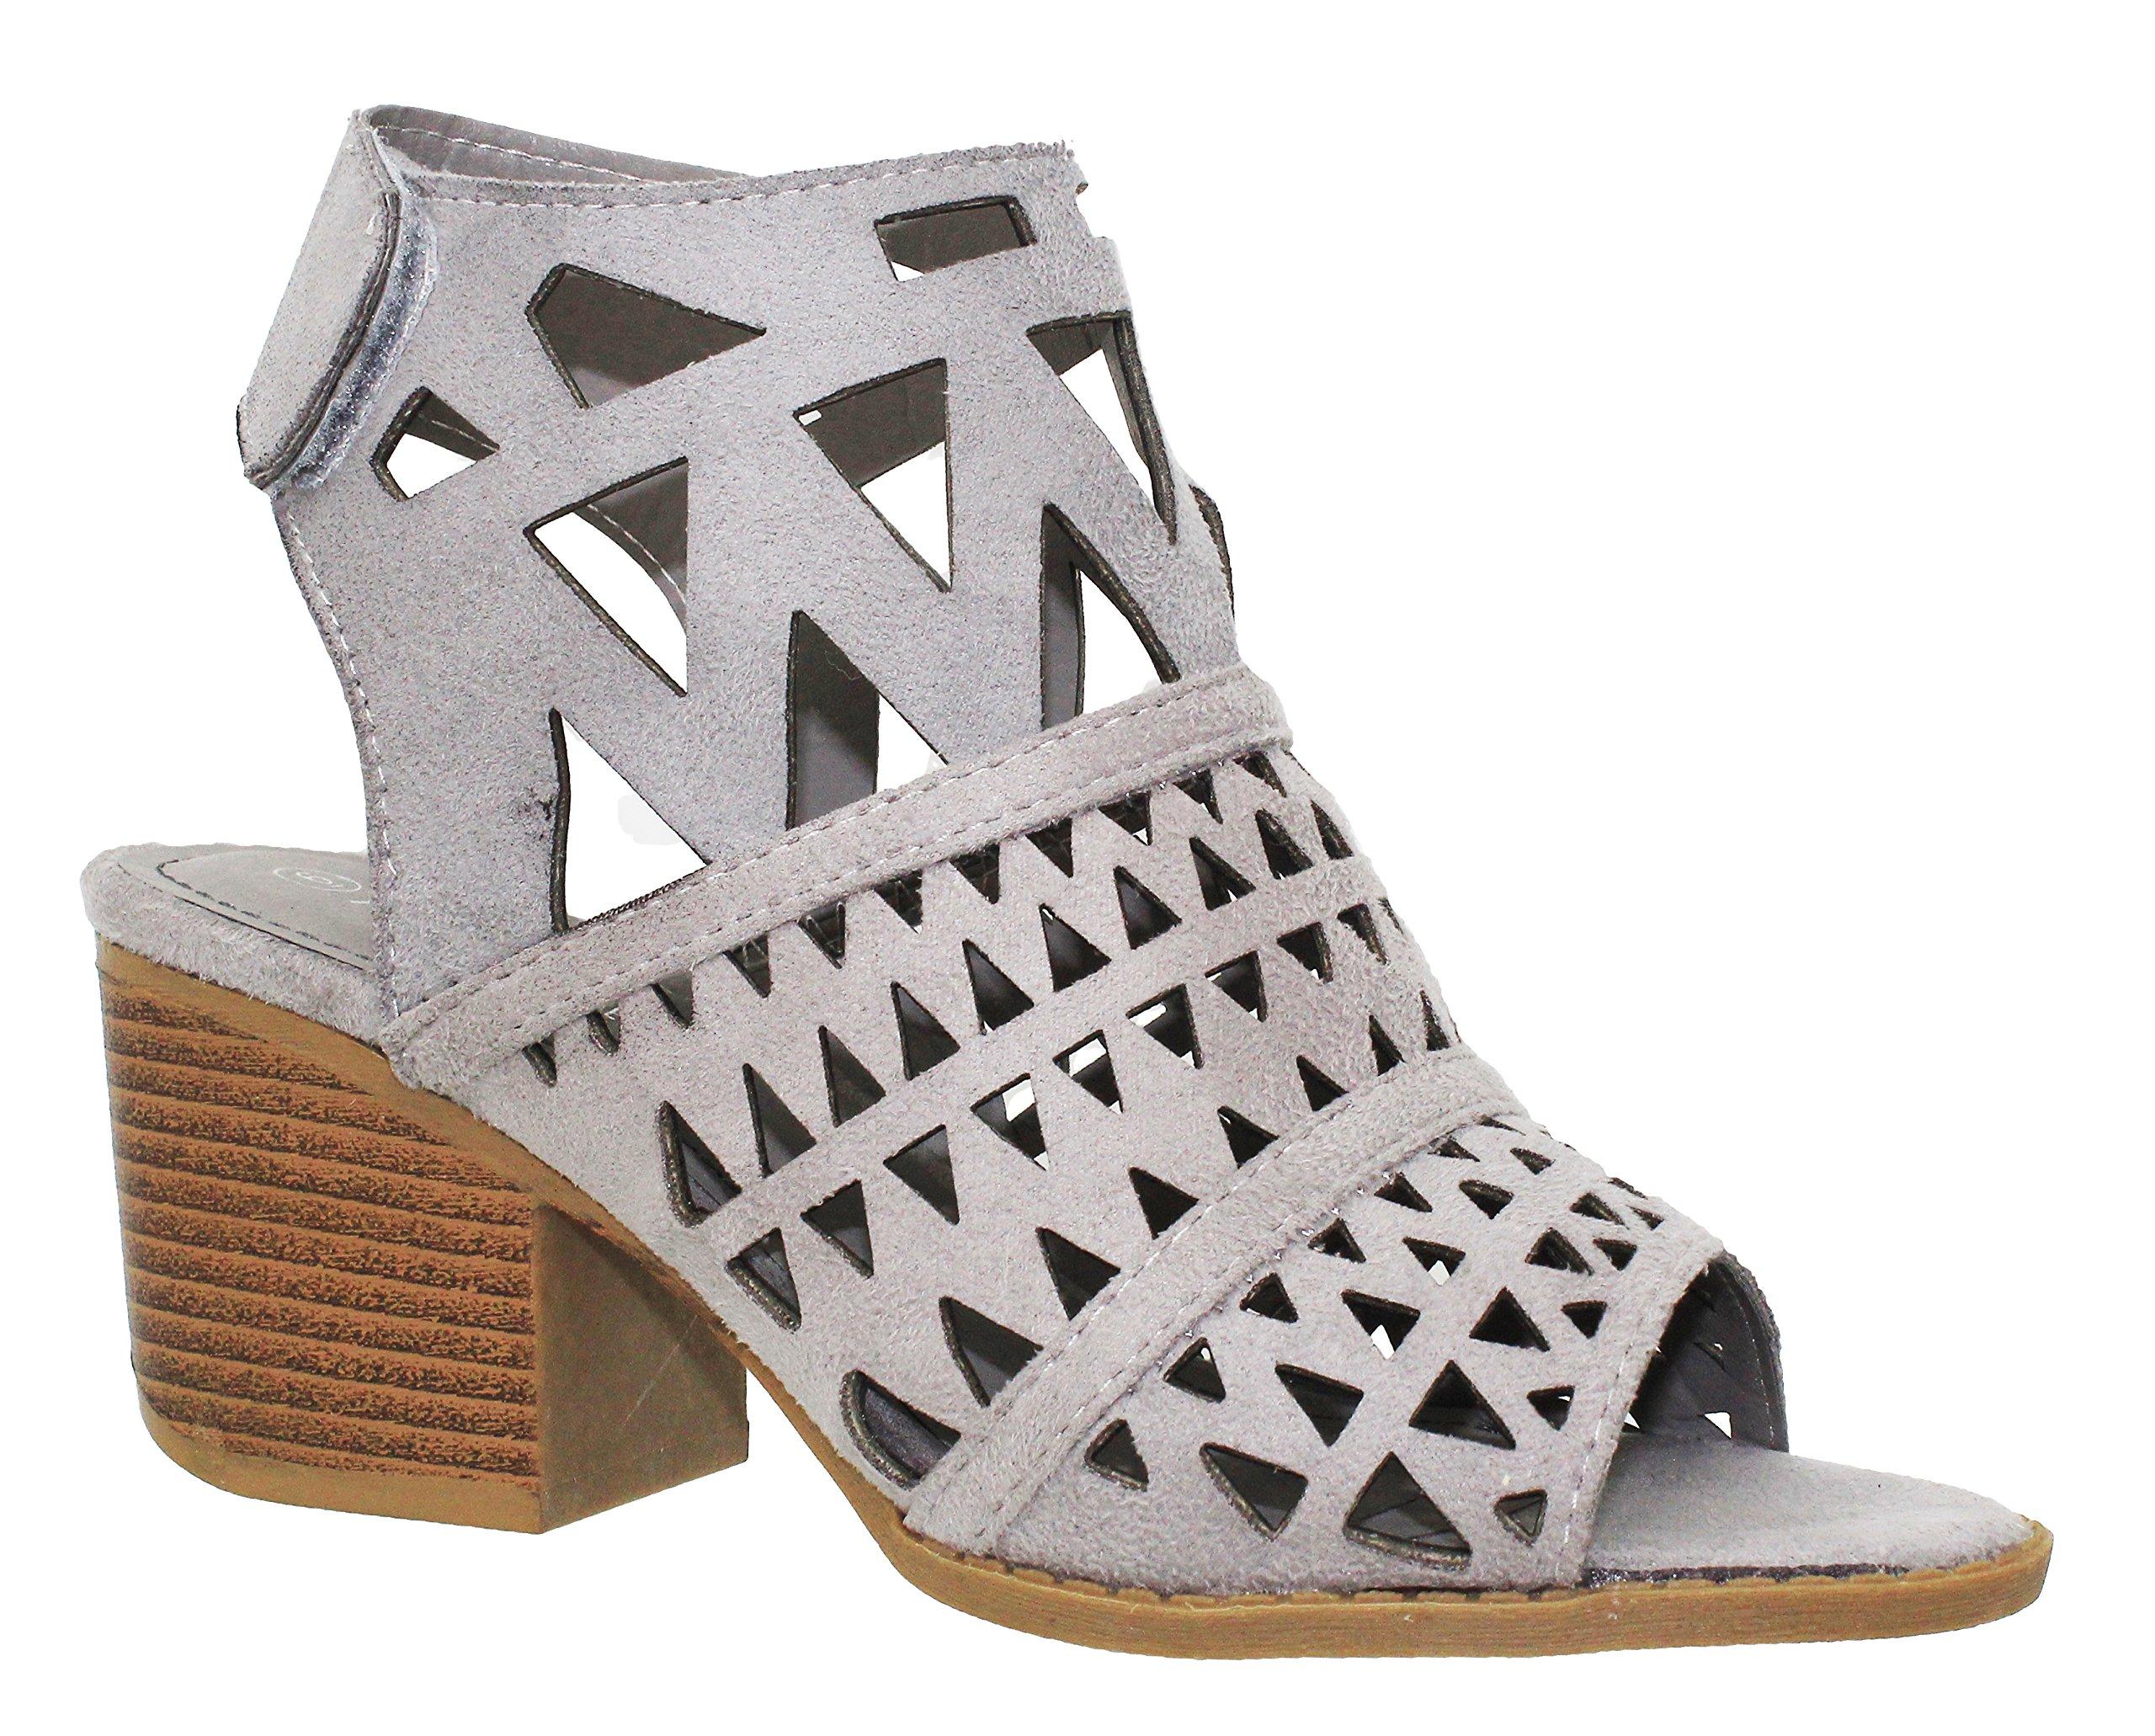 MVE Shoes Women's Ankle Velcro Open Toe Cutout Heeled-Sandals, Gray Size 10